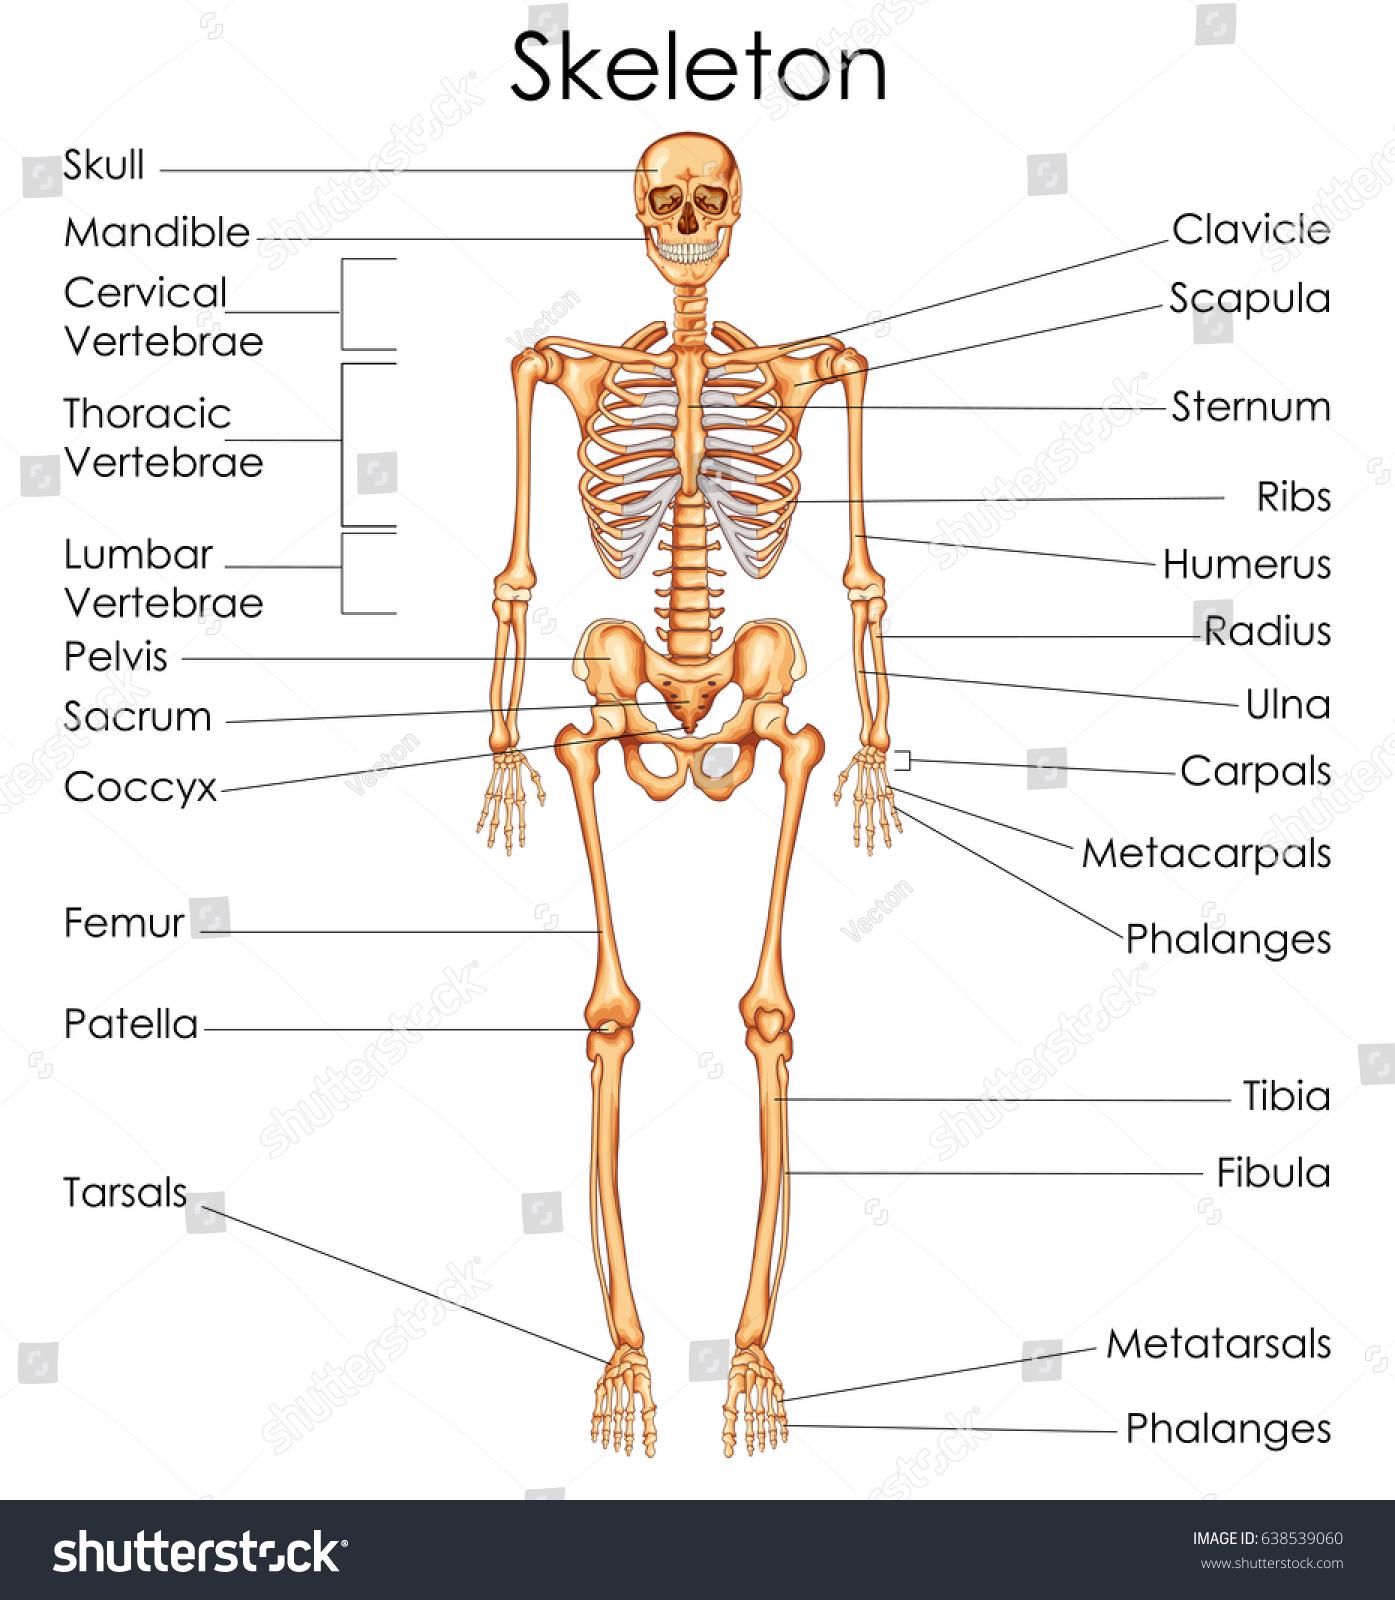 Detailed Human Skeleton Diagram Introduction To Electrical Wiring